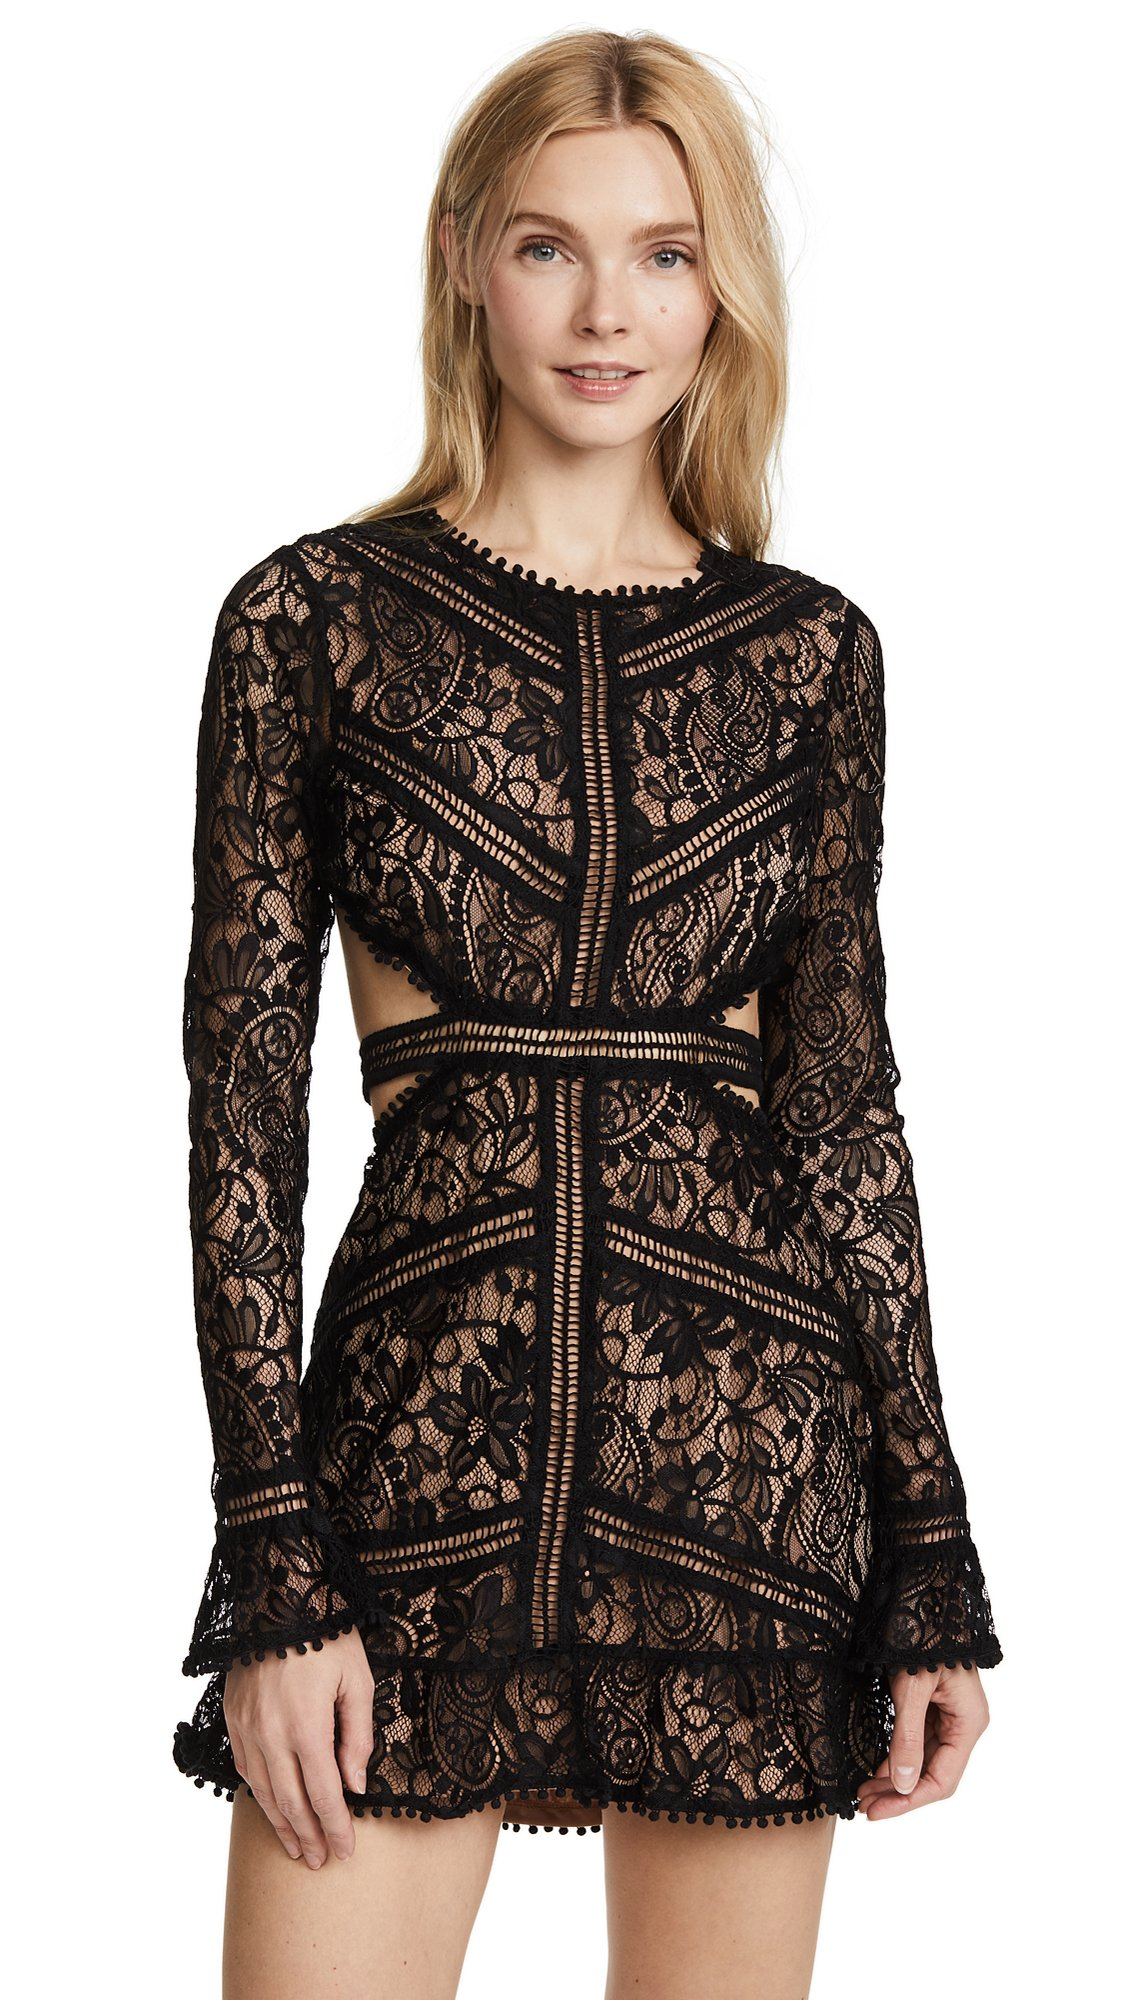 For Love & Lemons Women's Emerie Cut Out Dress, Black, L